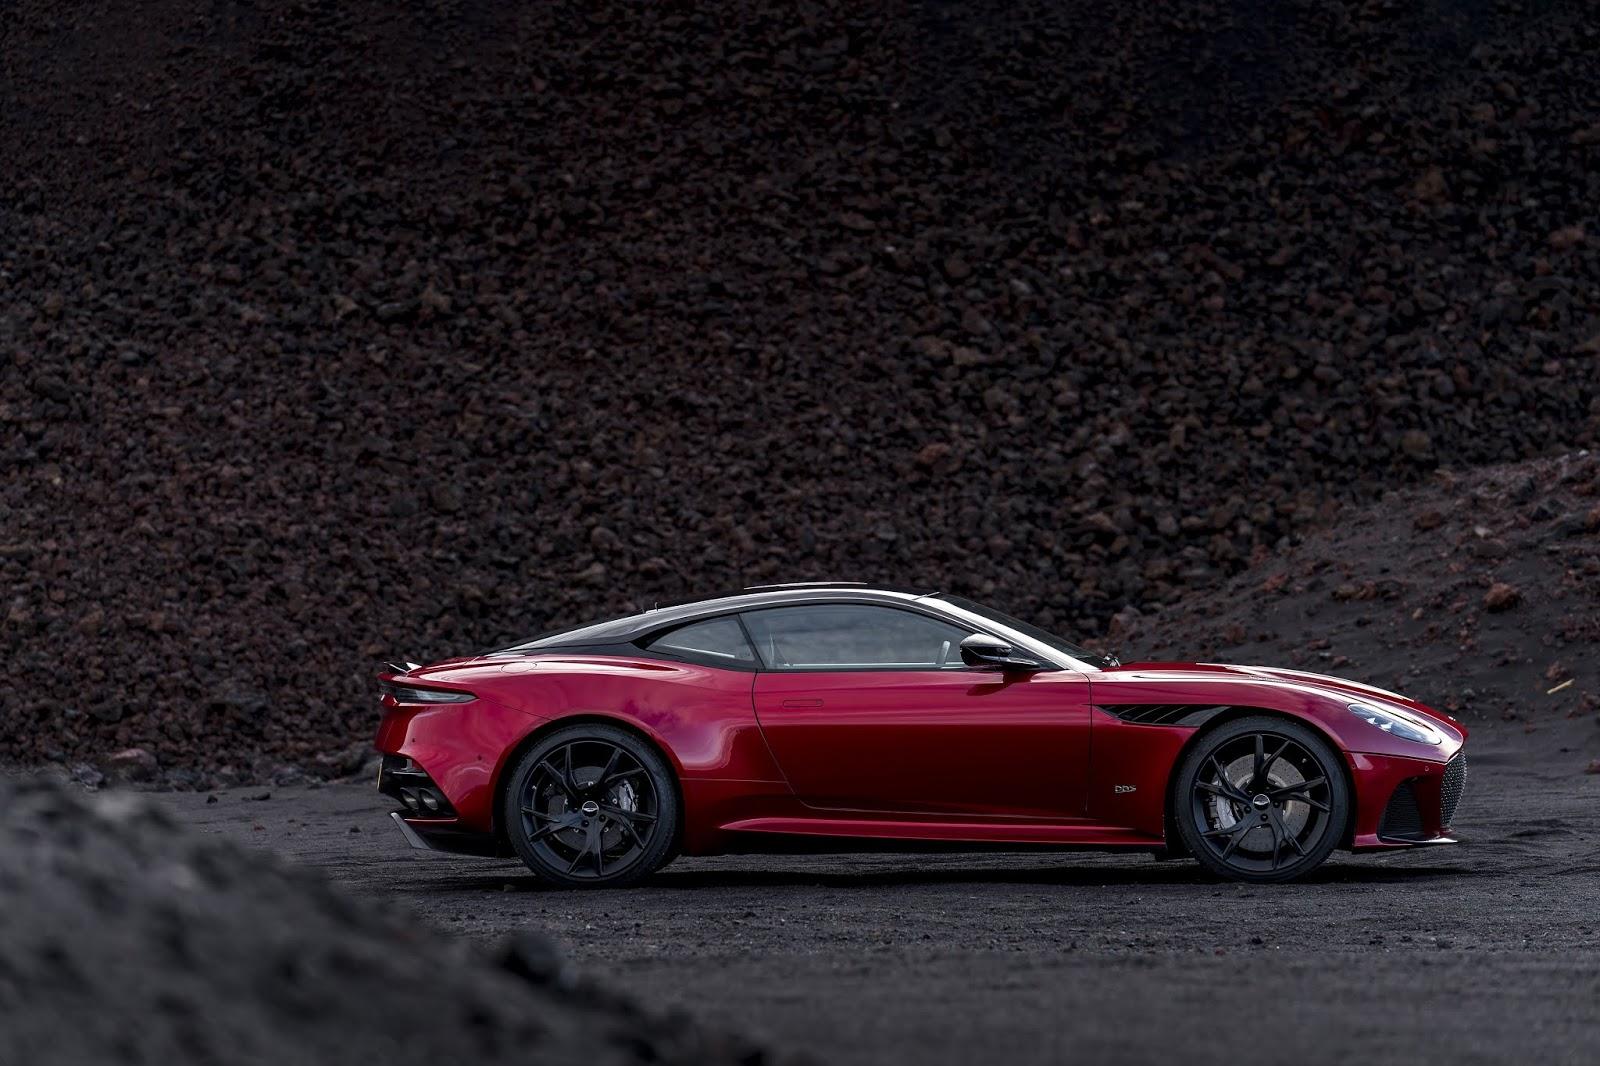 The Aston Martin Dbs Superleggera